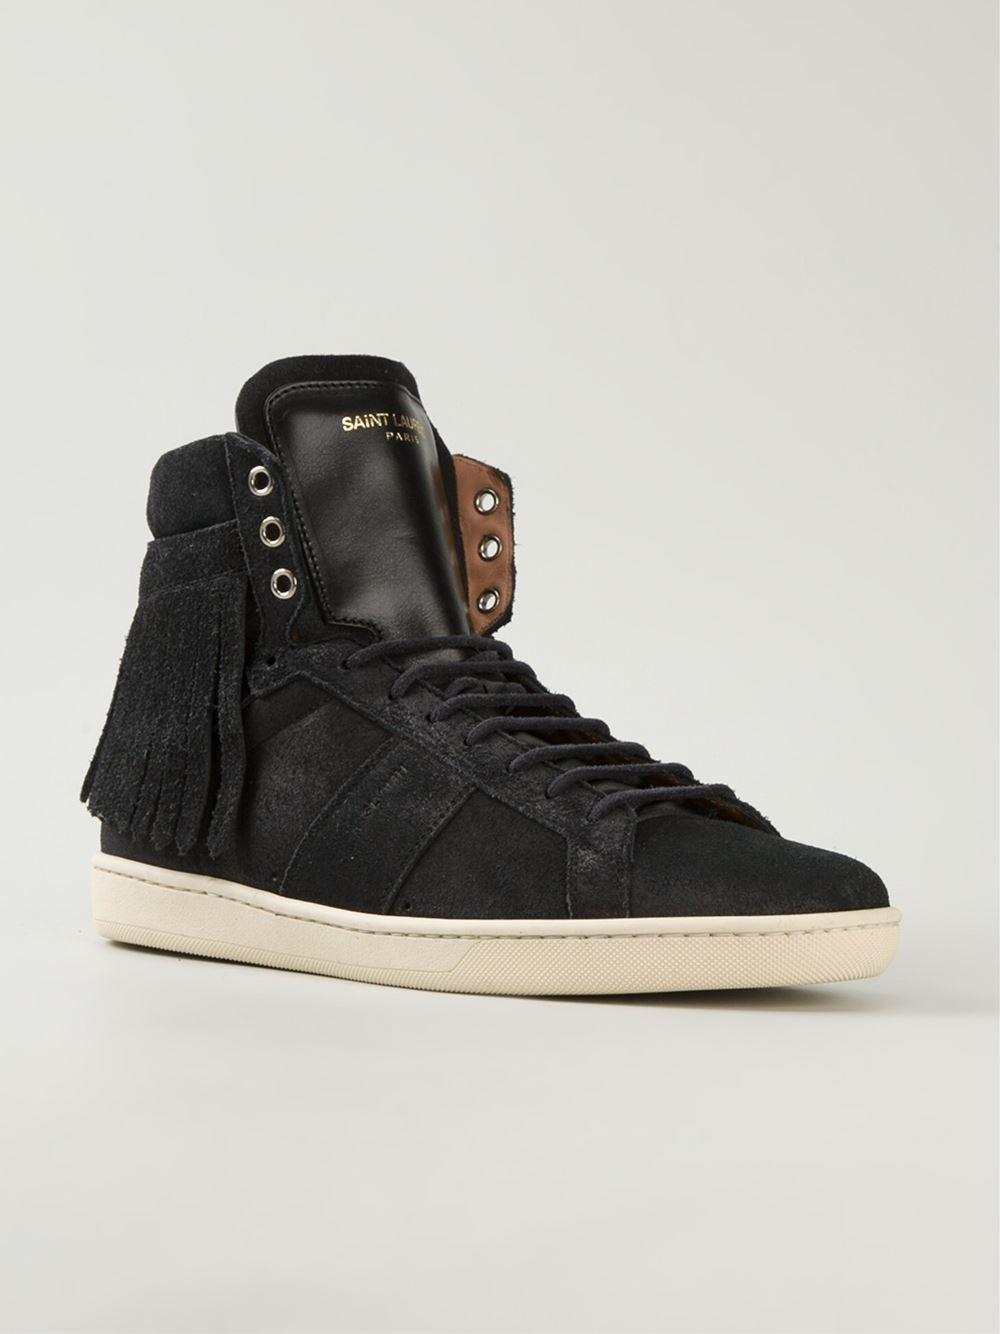 saint laurent 39 court classic 39 sneakers in black for men lyst. Black Bedroom Furniture Sets. Home Design Ideas